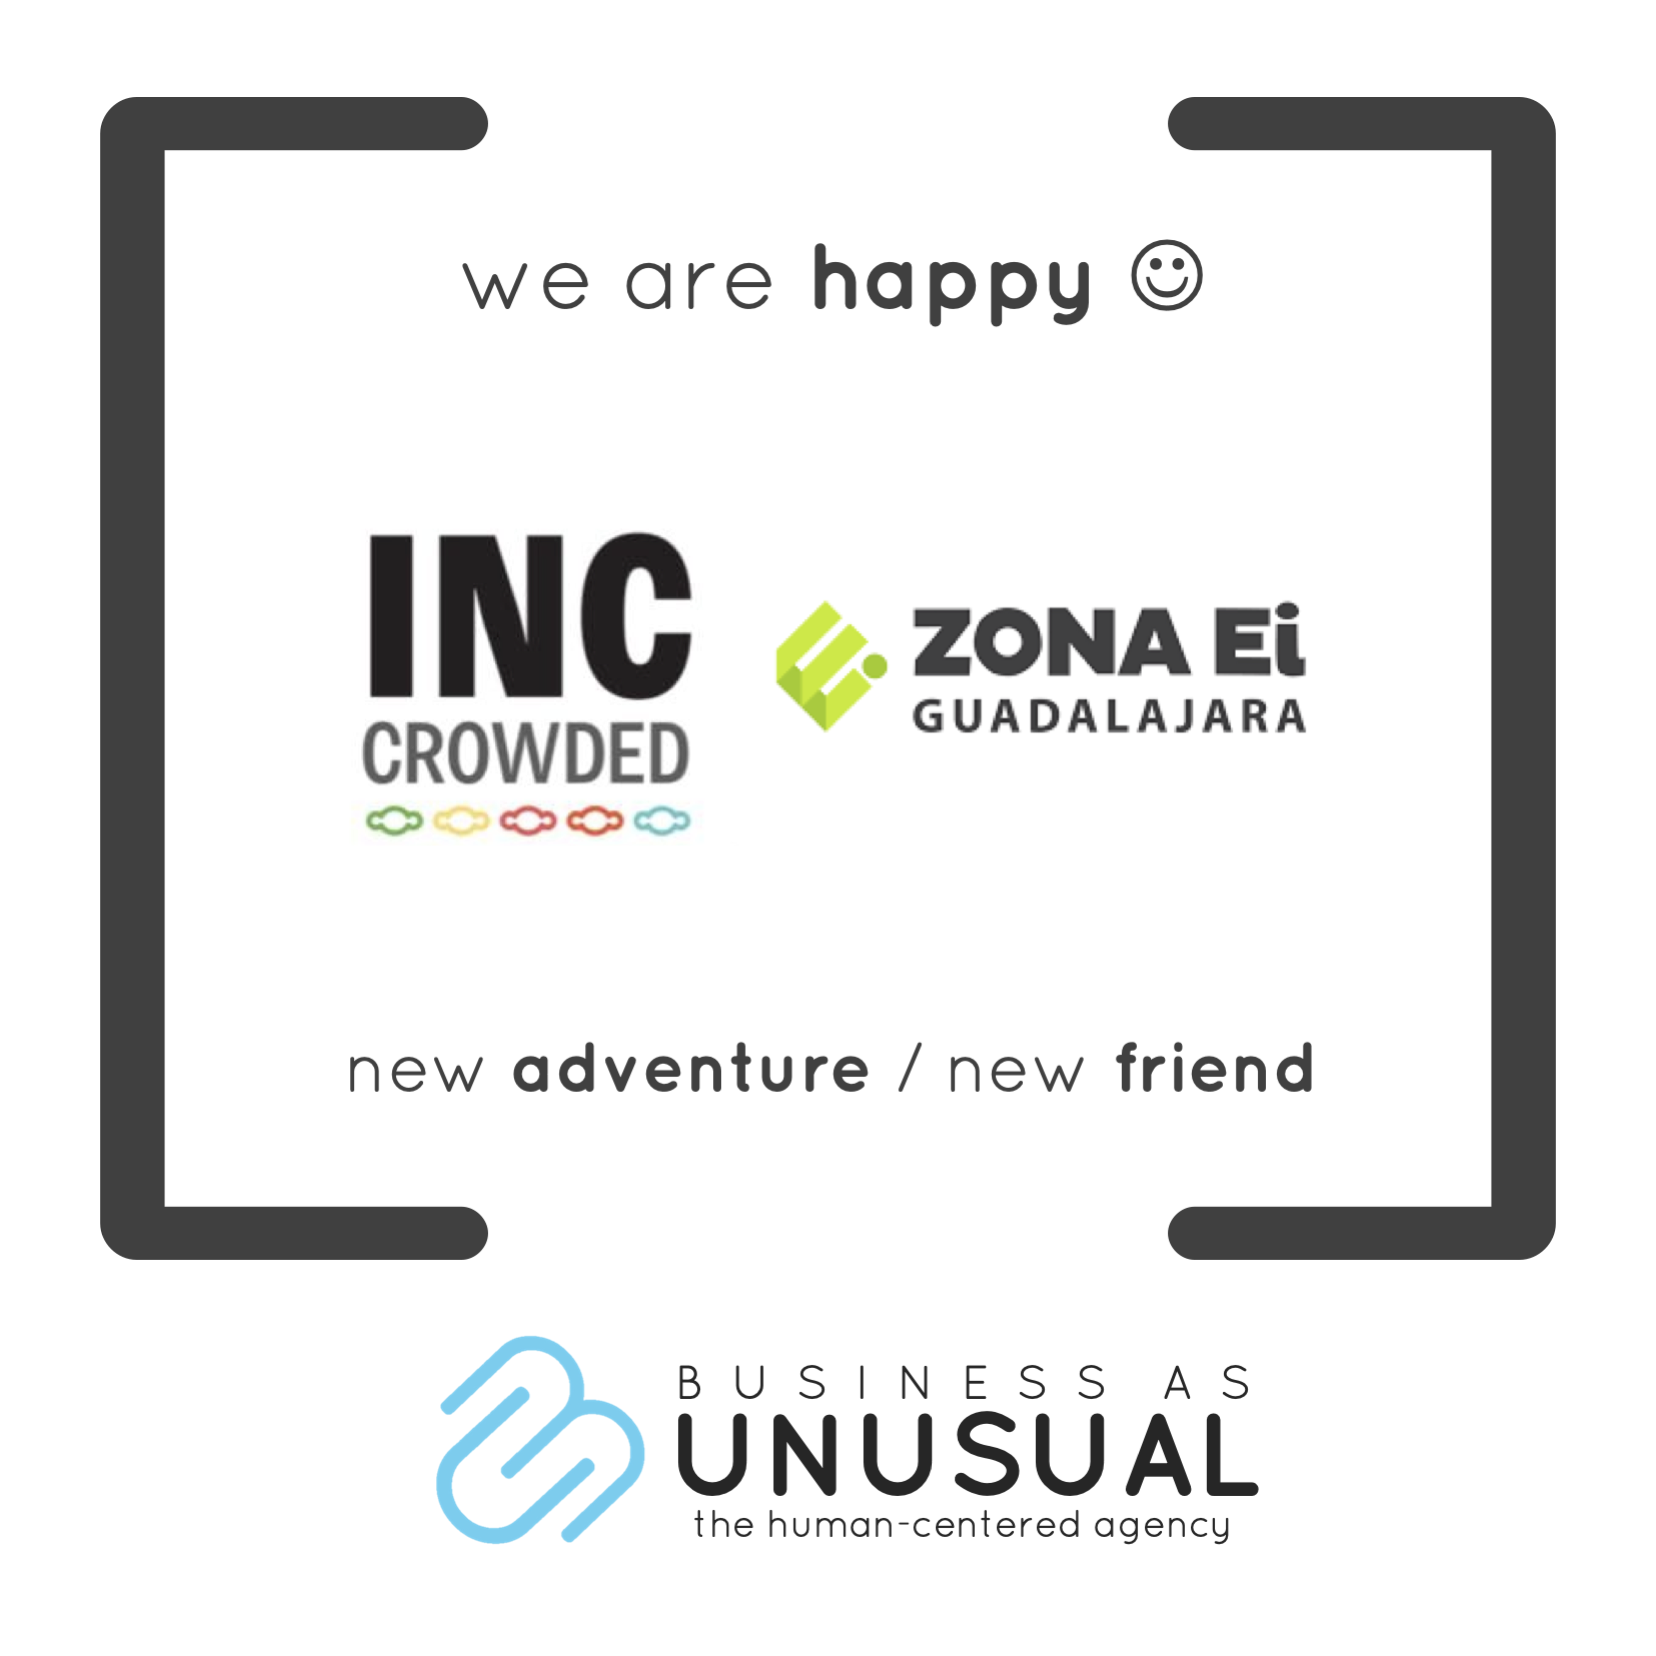 INCCrowded - The Startup Festival / Instituto Tecnológico y de Estudios Superiores de Monterrey (ITESM) Zona Ei Campus Guadalajara